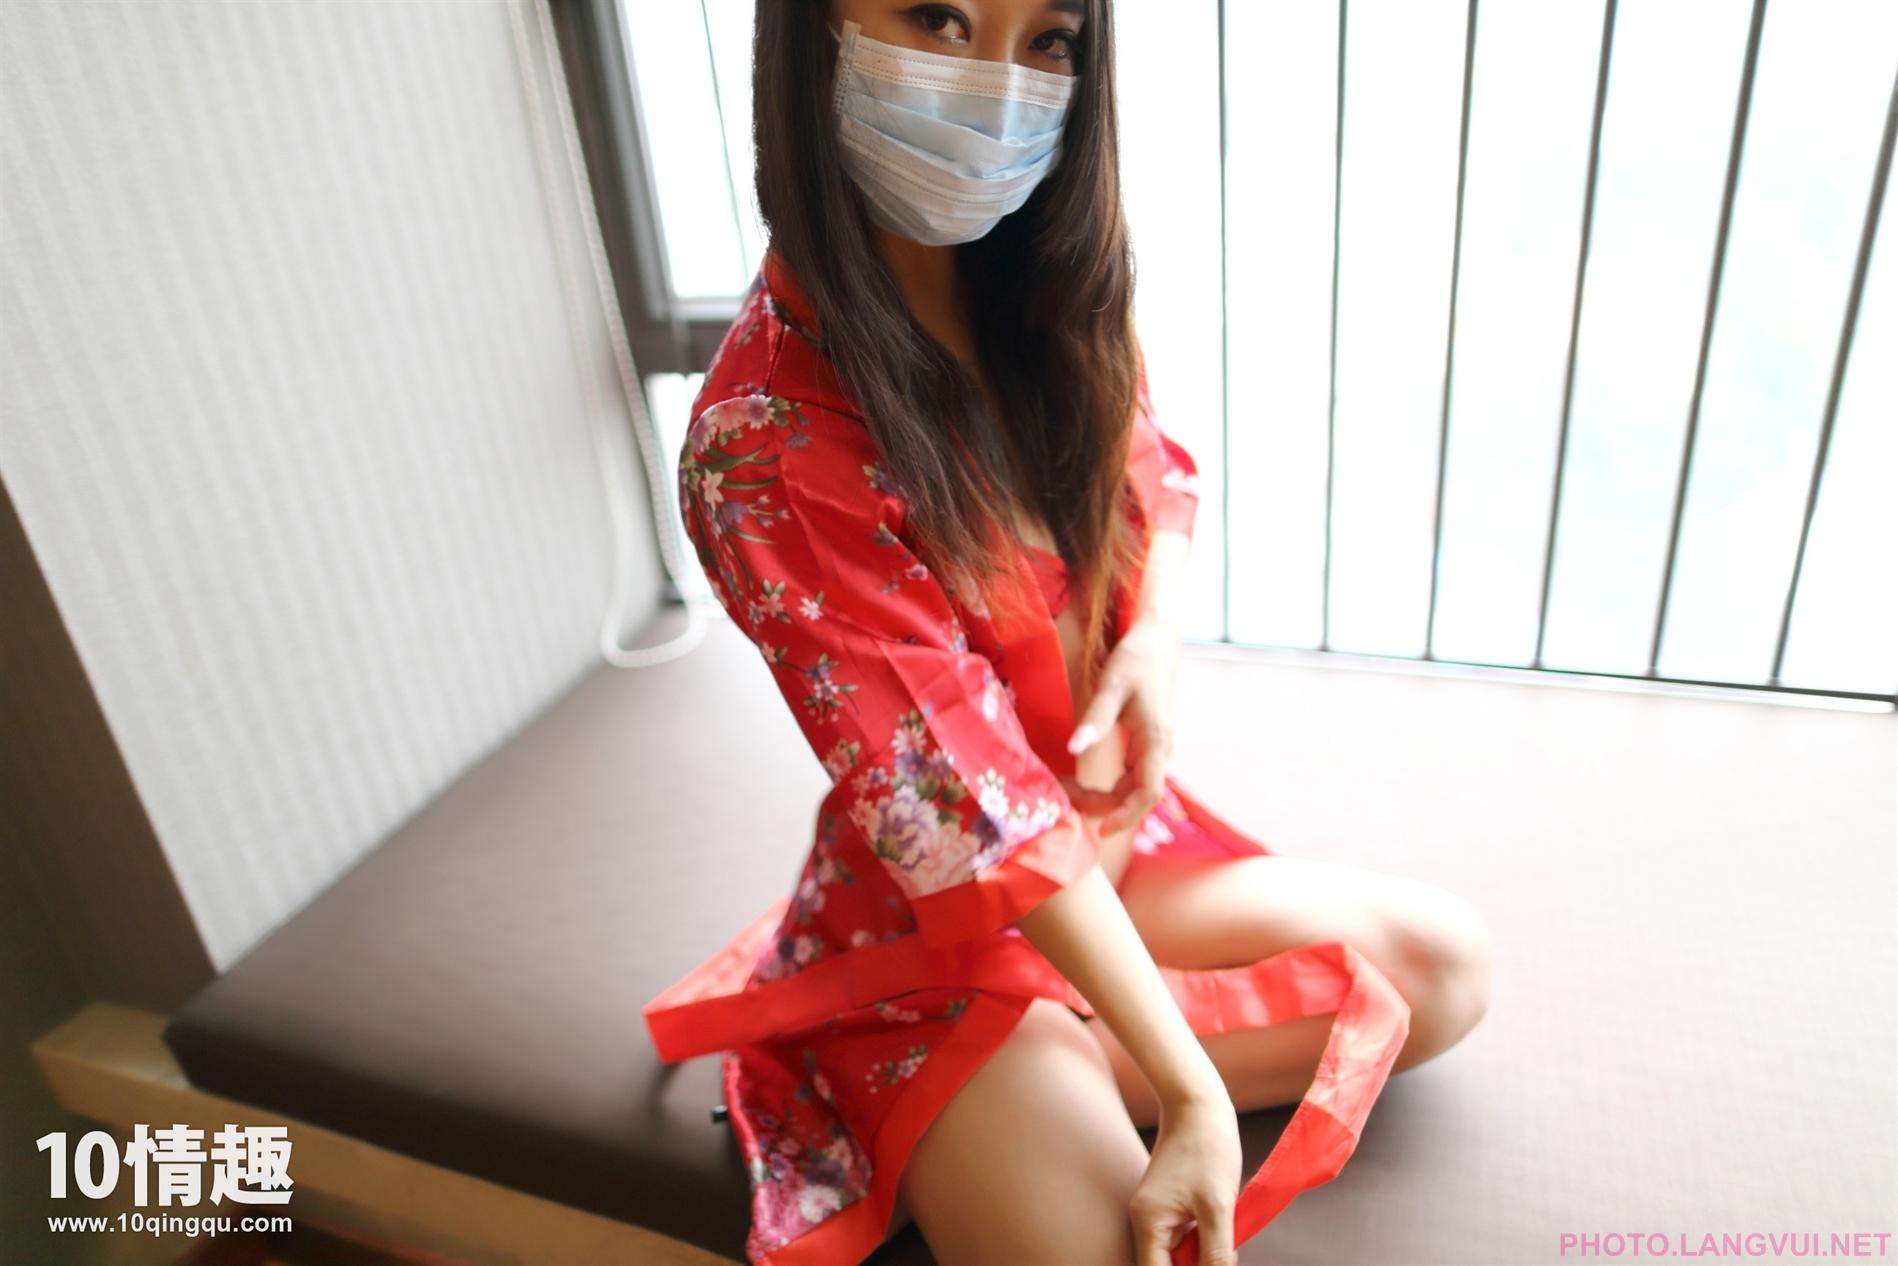 10QingQu Mask Series No 065